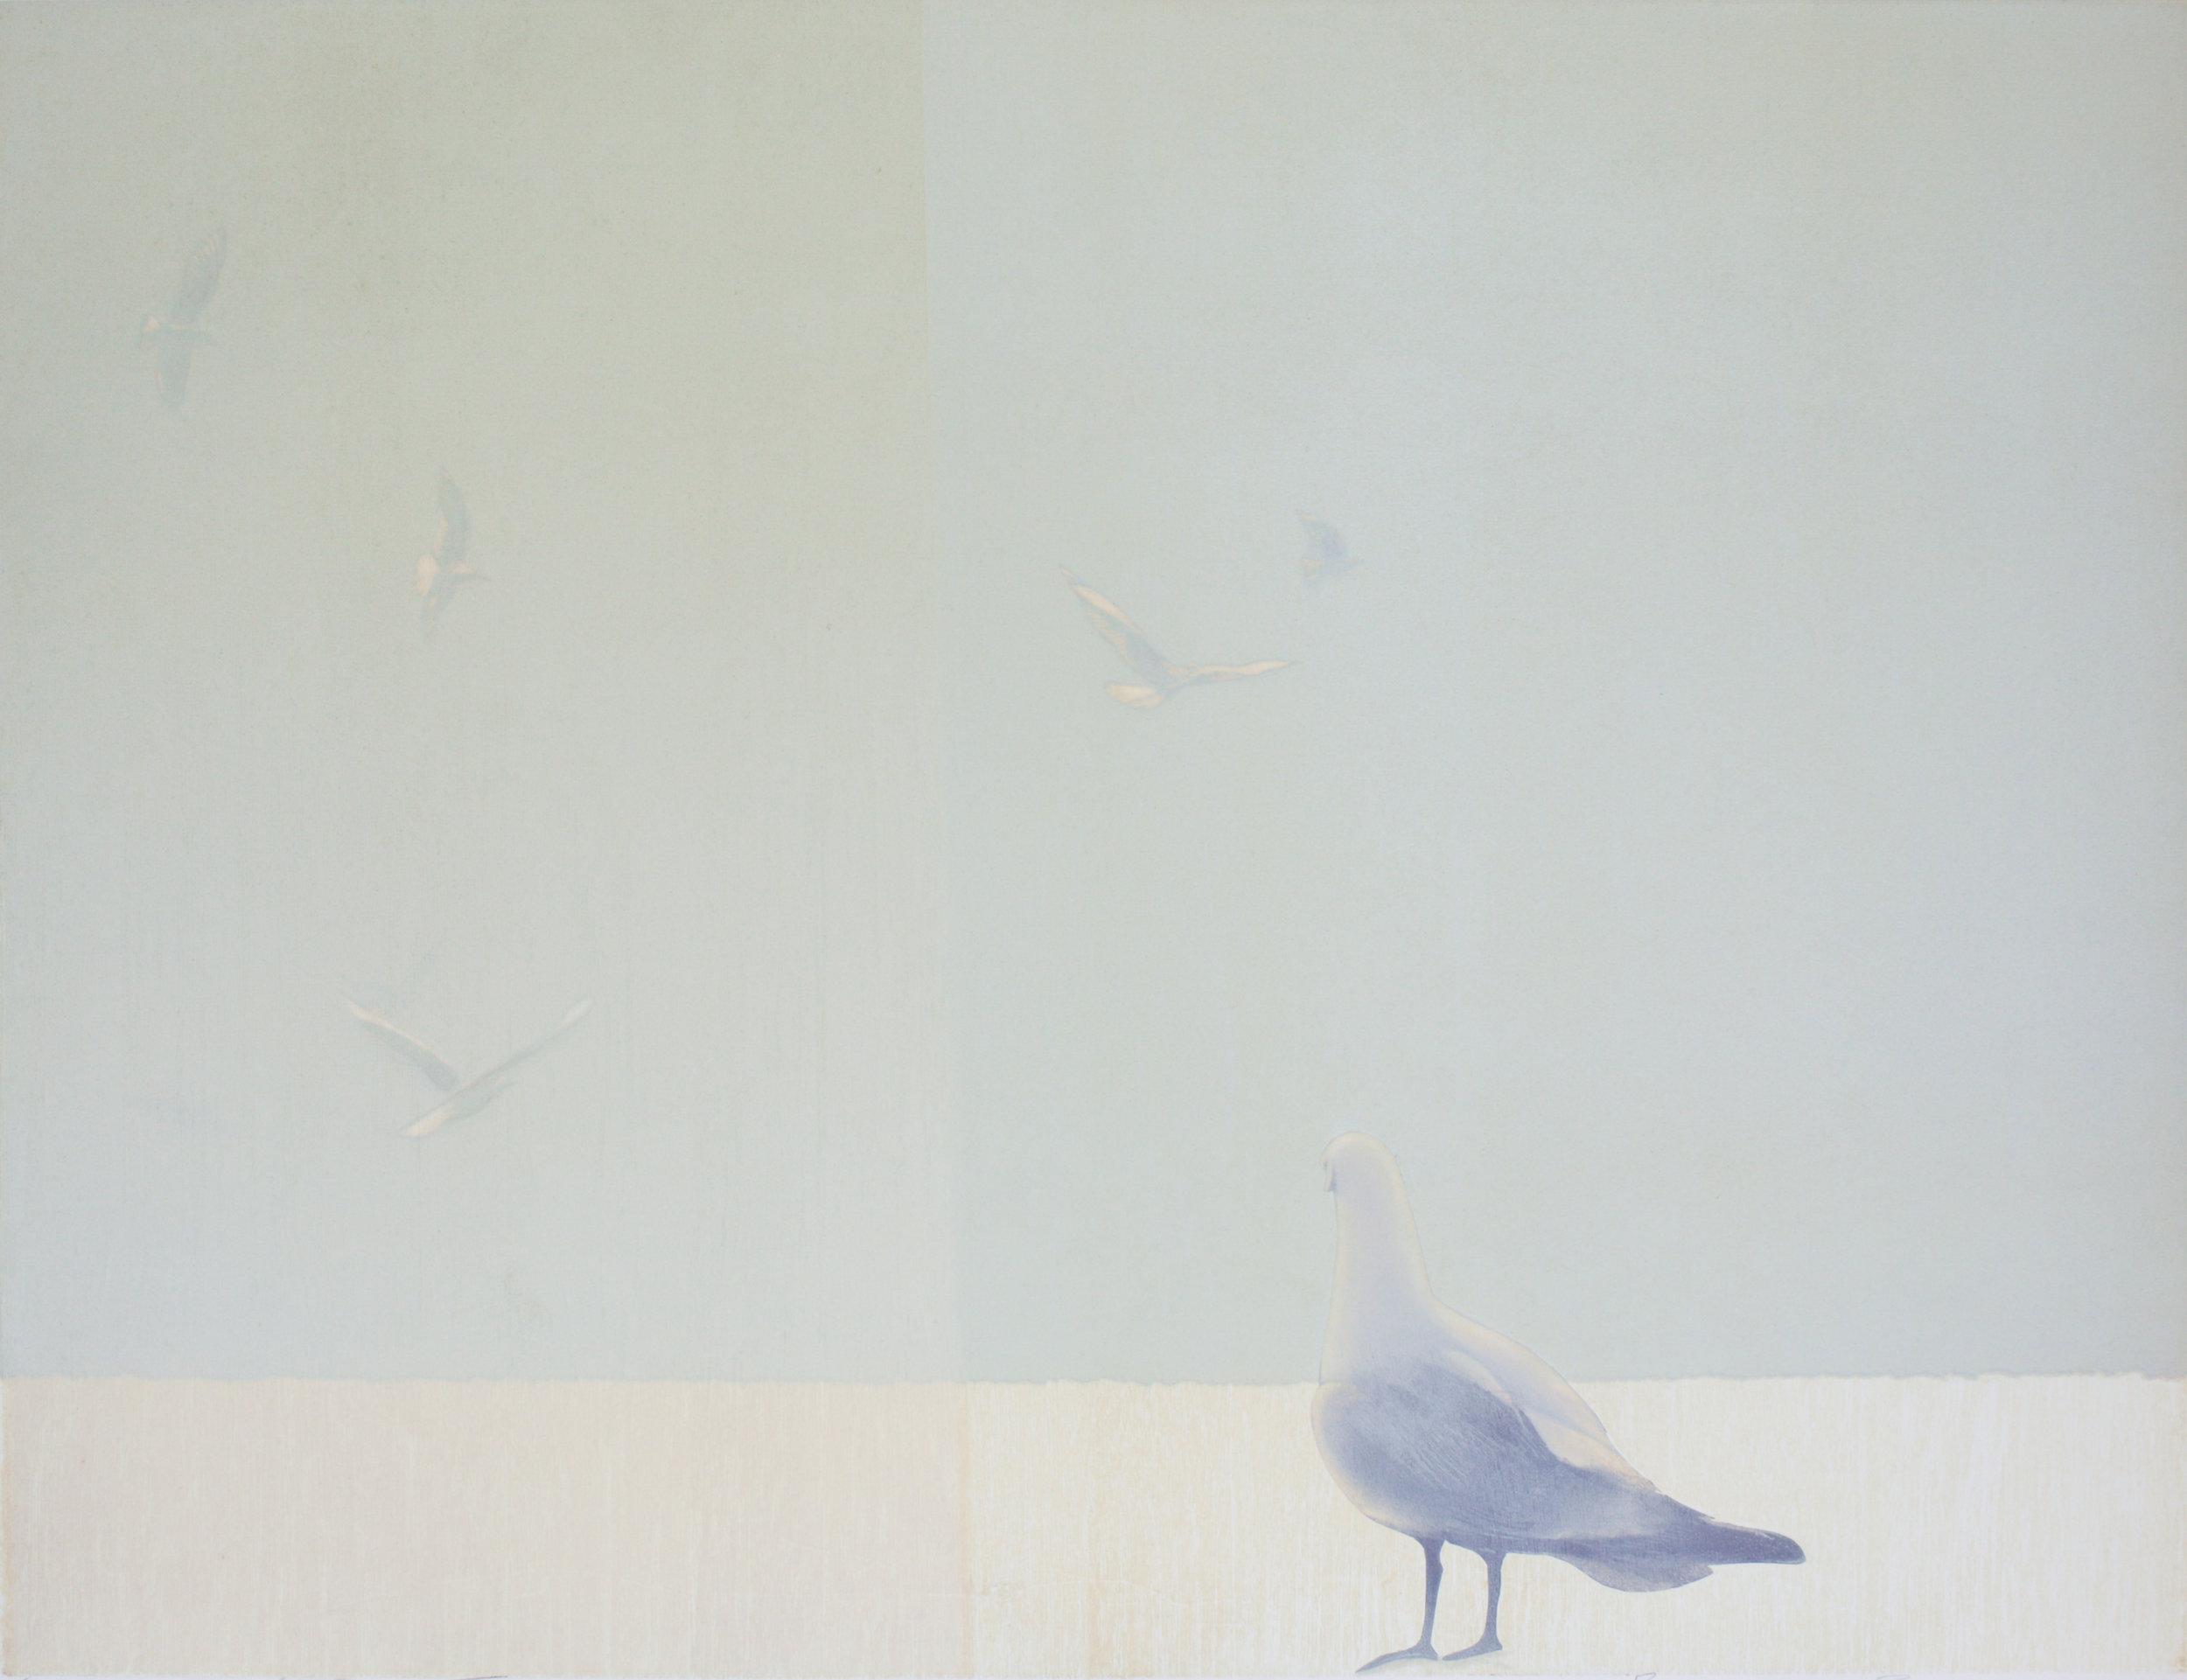 Praween Piangchoompu, Middle of Nowhere #2, 2018, Woodcut on Paper, 5 of 5, 85.8 x 61 cm, Affinity Art.jpg